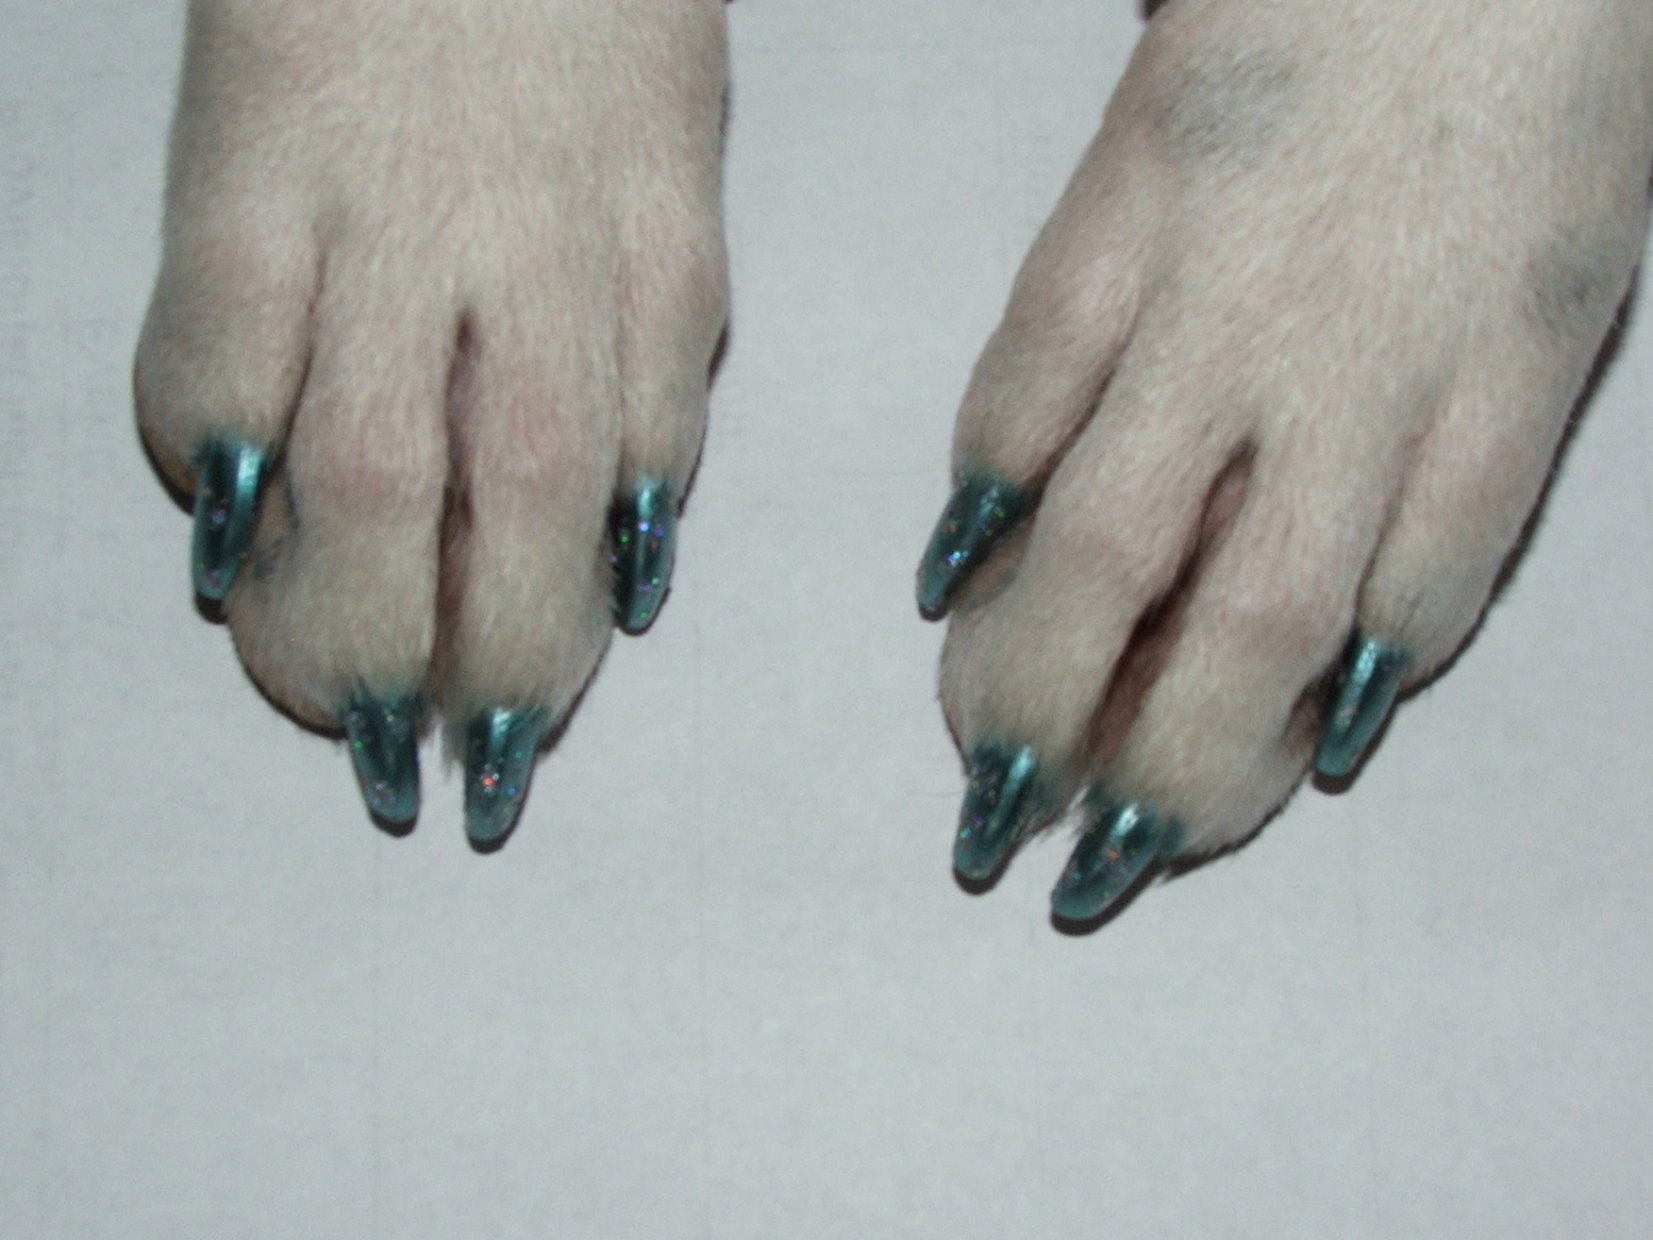 Question about nail polish! - Page 3 - Poodle Forum - Standard ...